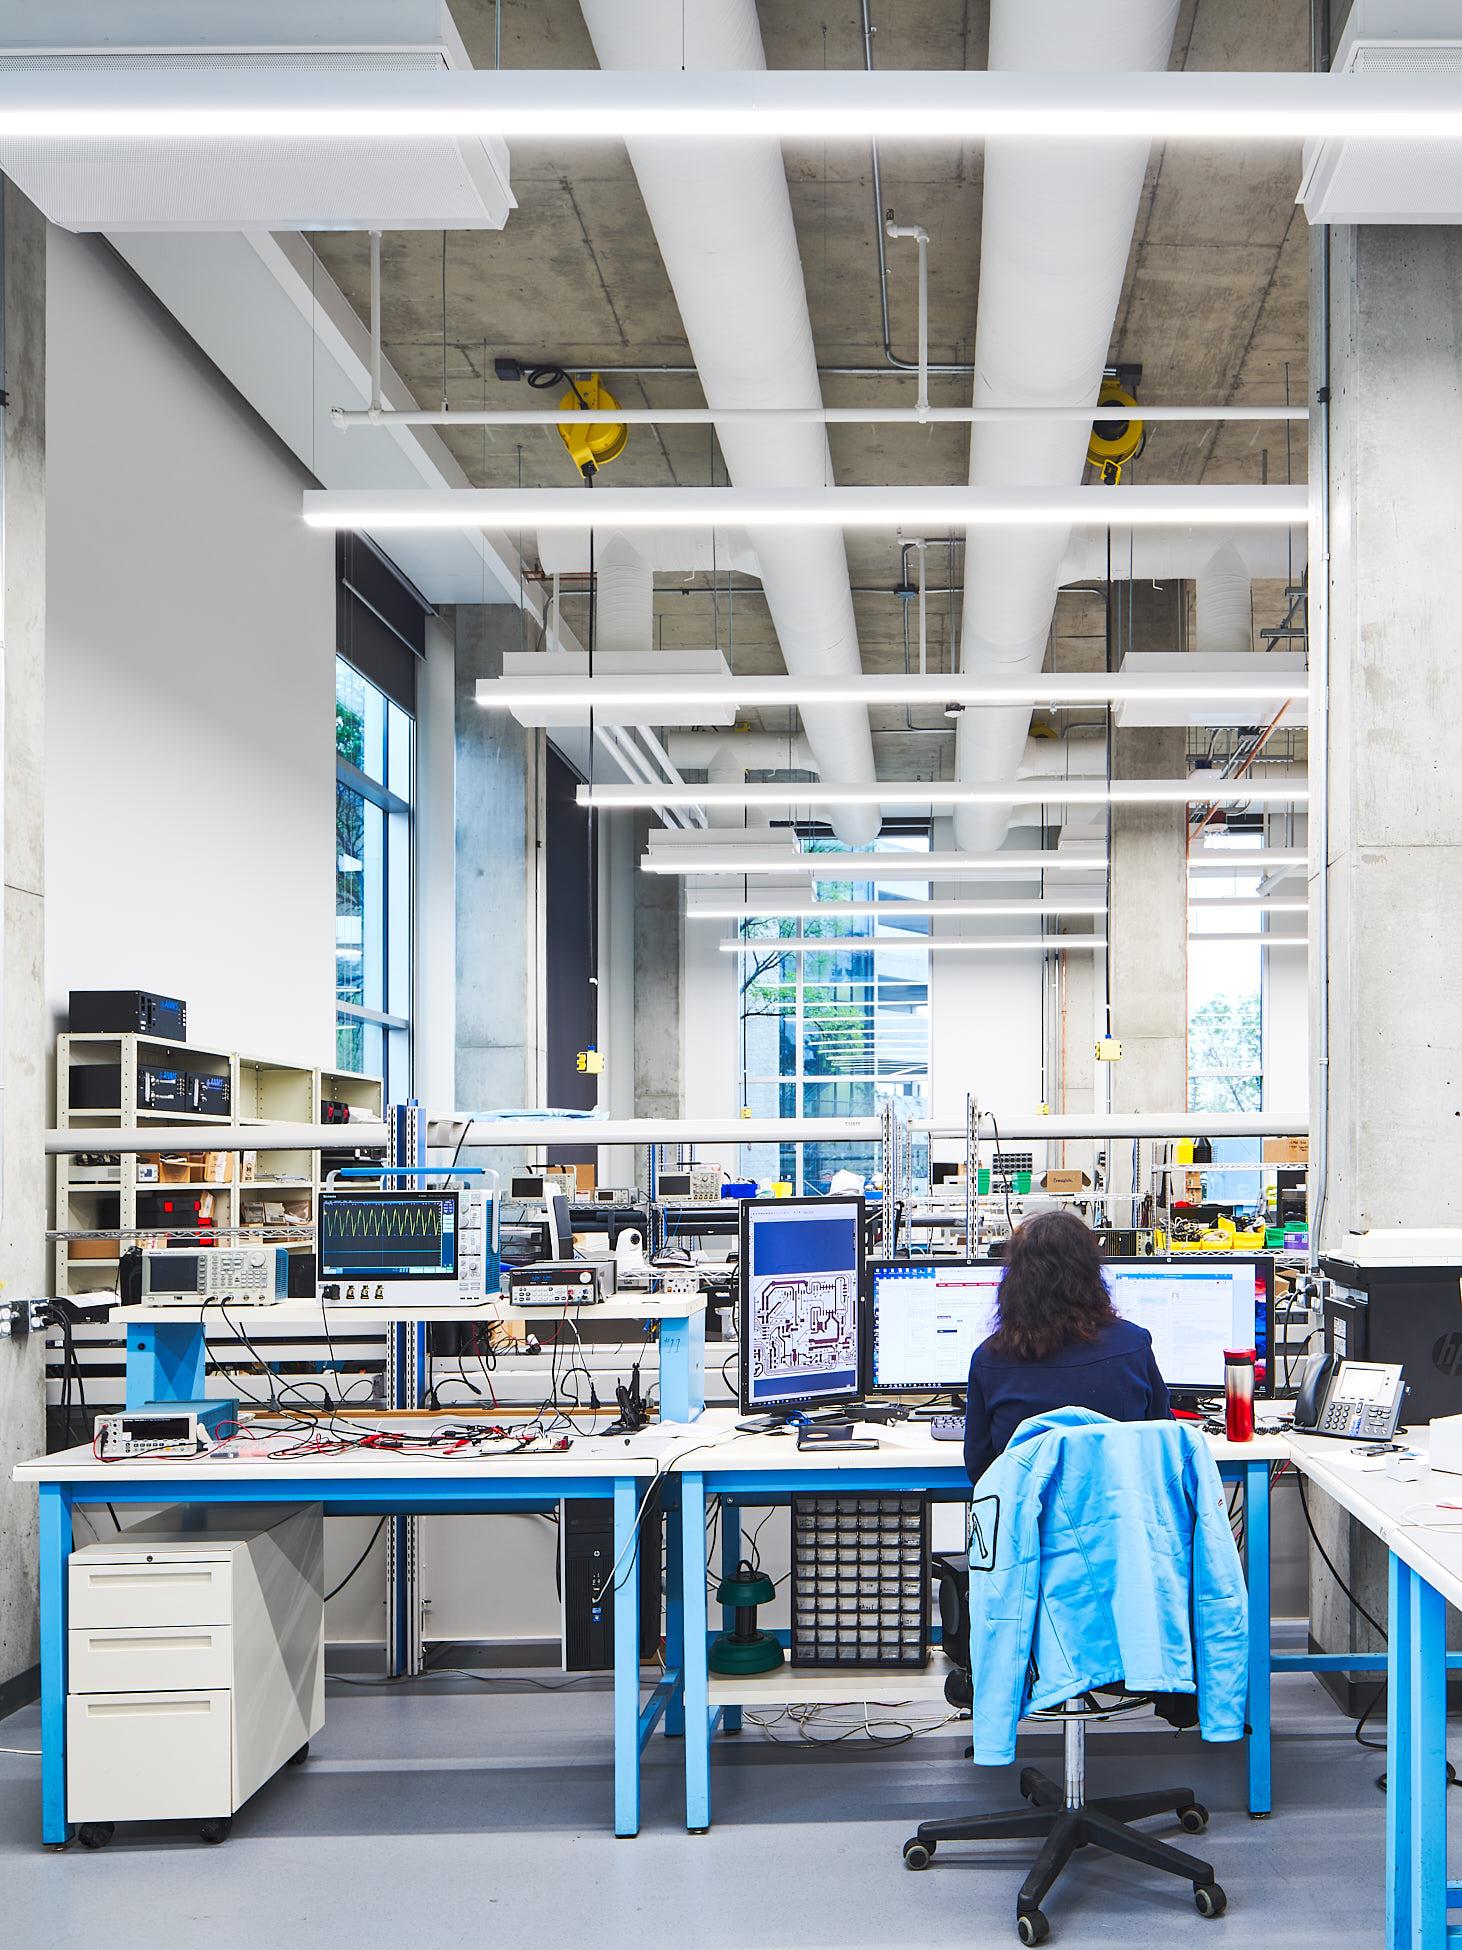 NAIT Productivity and Innovation Centre